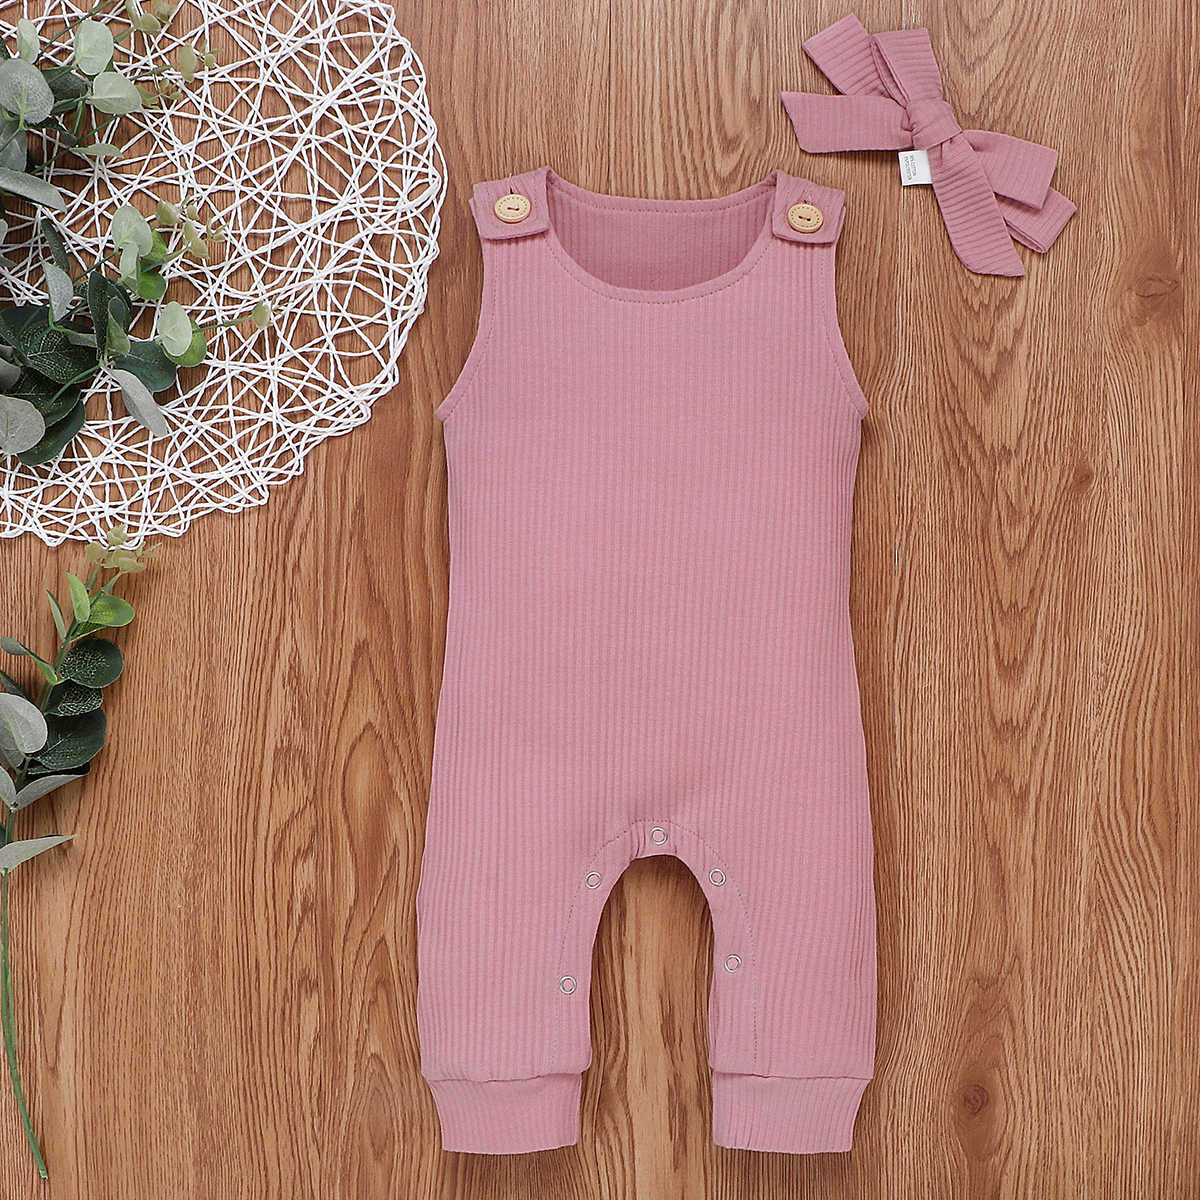 2020 Bebé Ropa de verano recién nacido bebé niña niño mono de salto sin mangas de lana blanca + diadema acanalada ropa conjunto